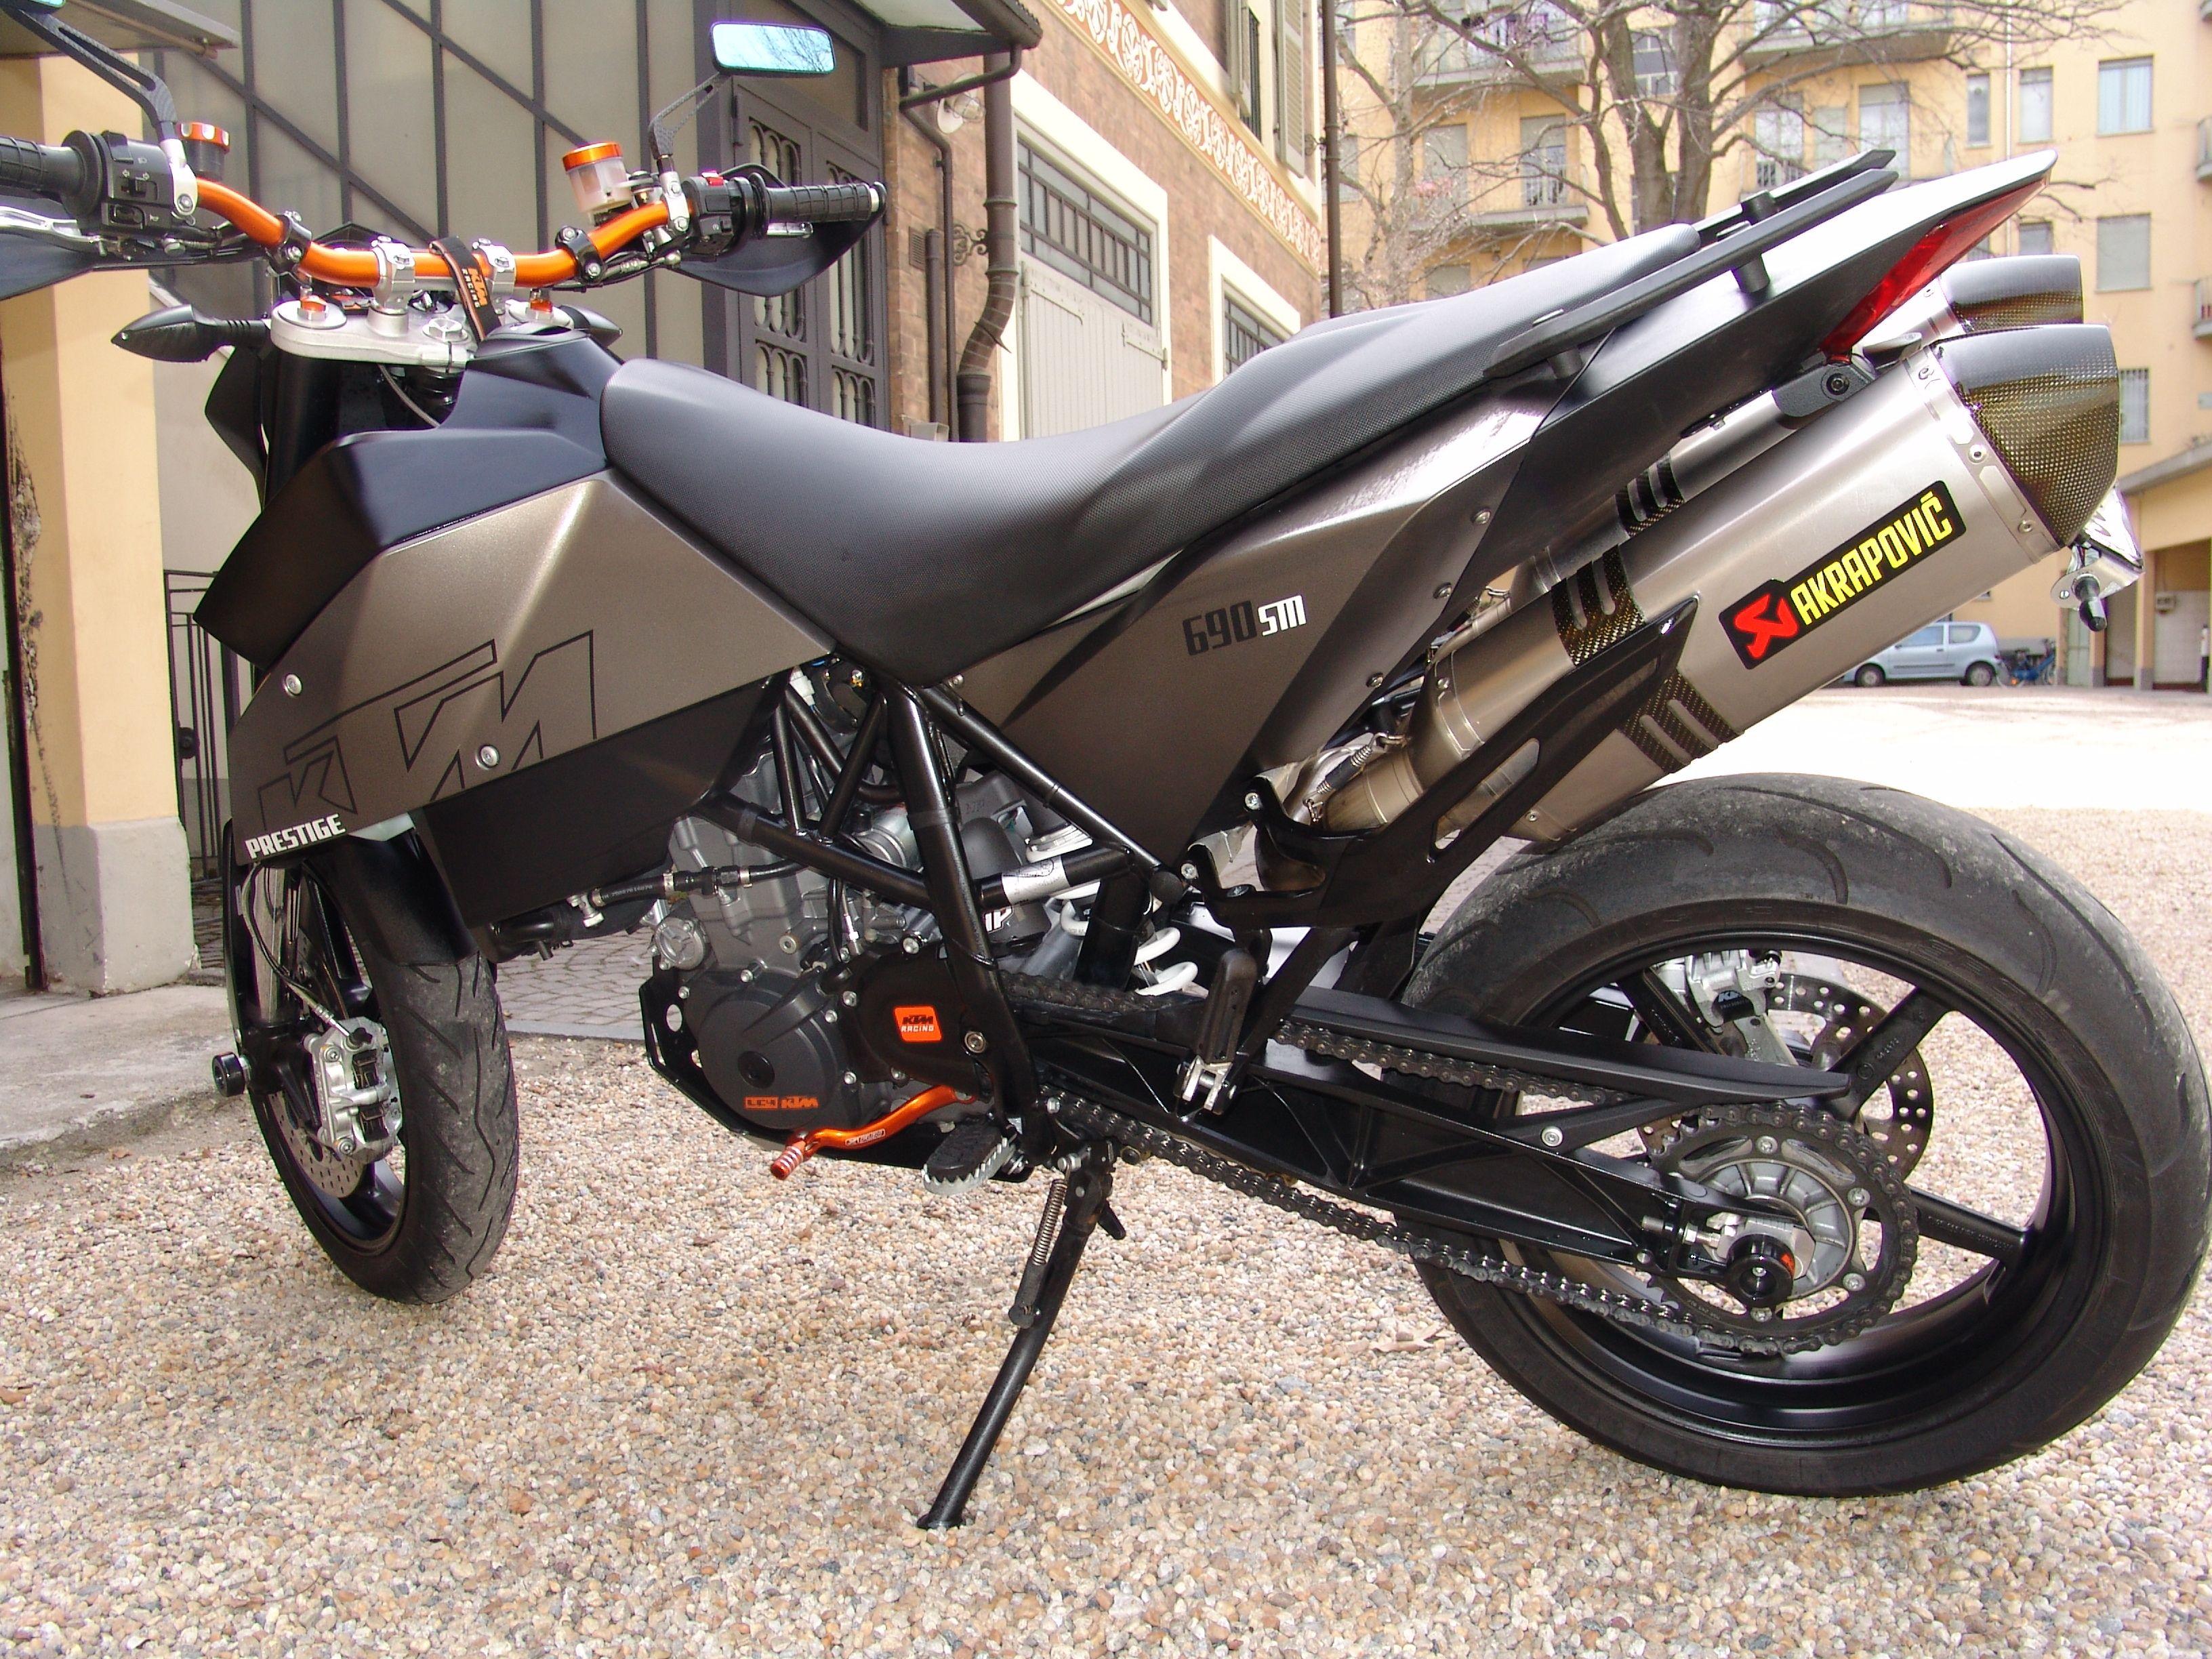 Supermoto ktm 690 stunt concept bikemotorcycletuned car tuning car - Supermoto Ktm 690 Stunt Concept Bikemotorcycletuned Car Tuning Car 26